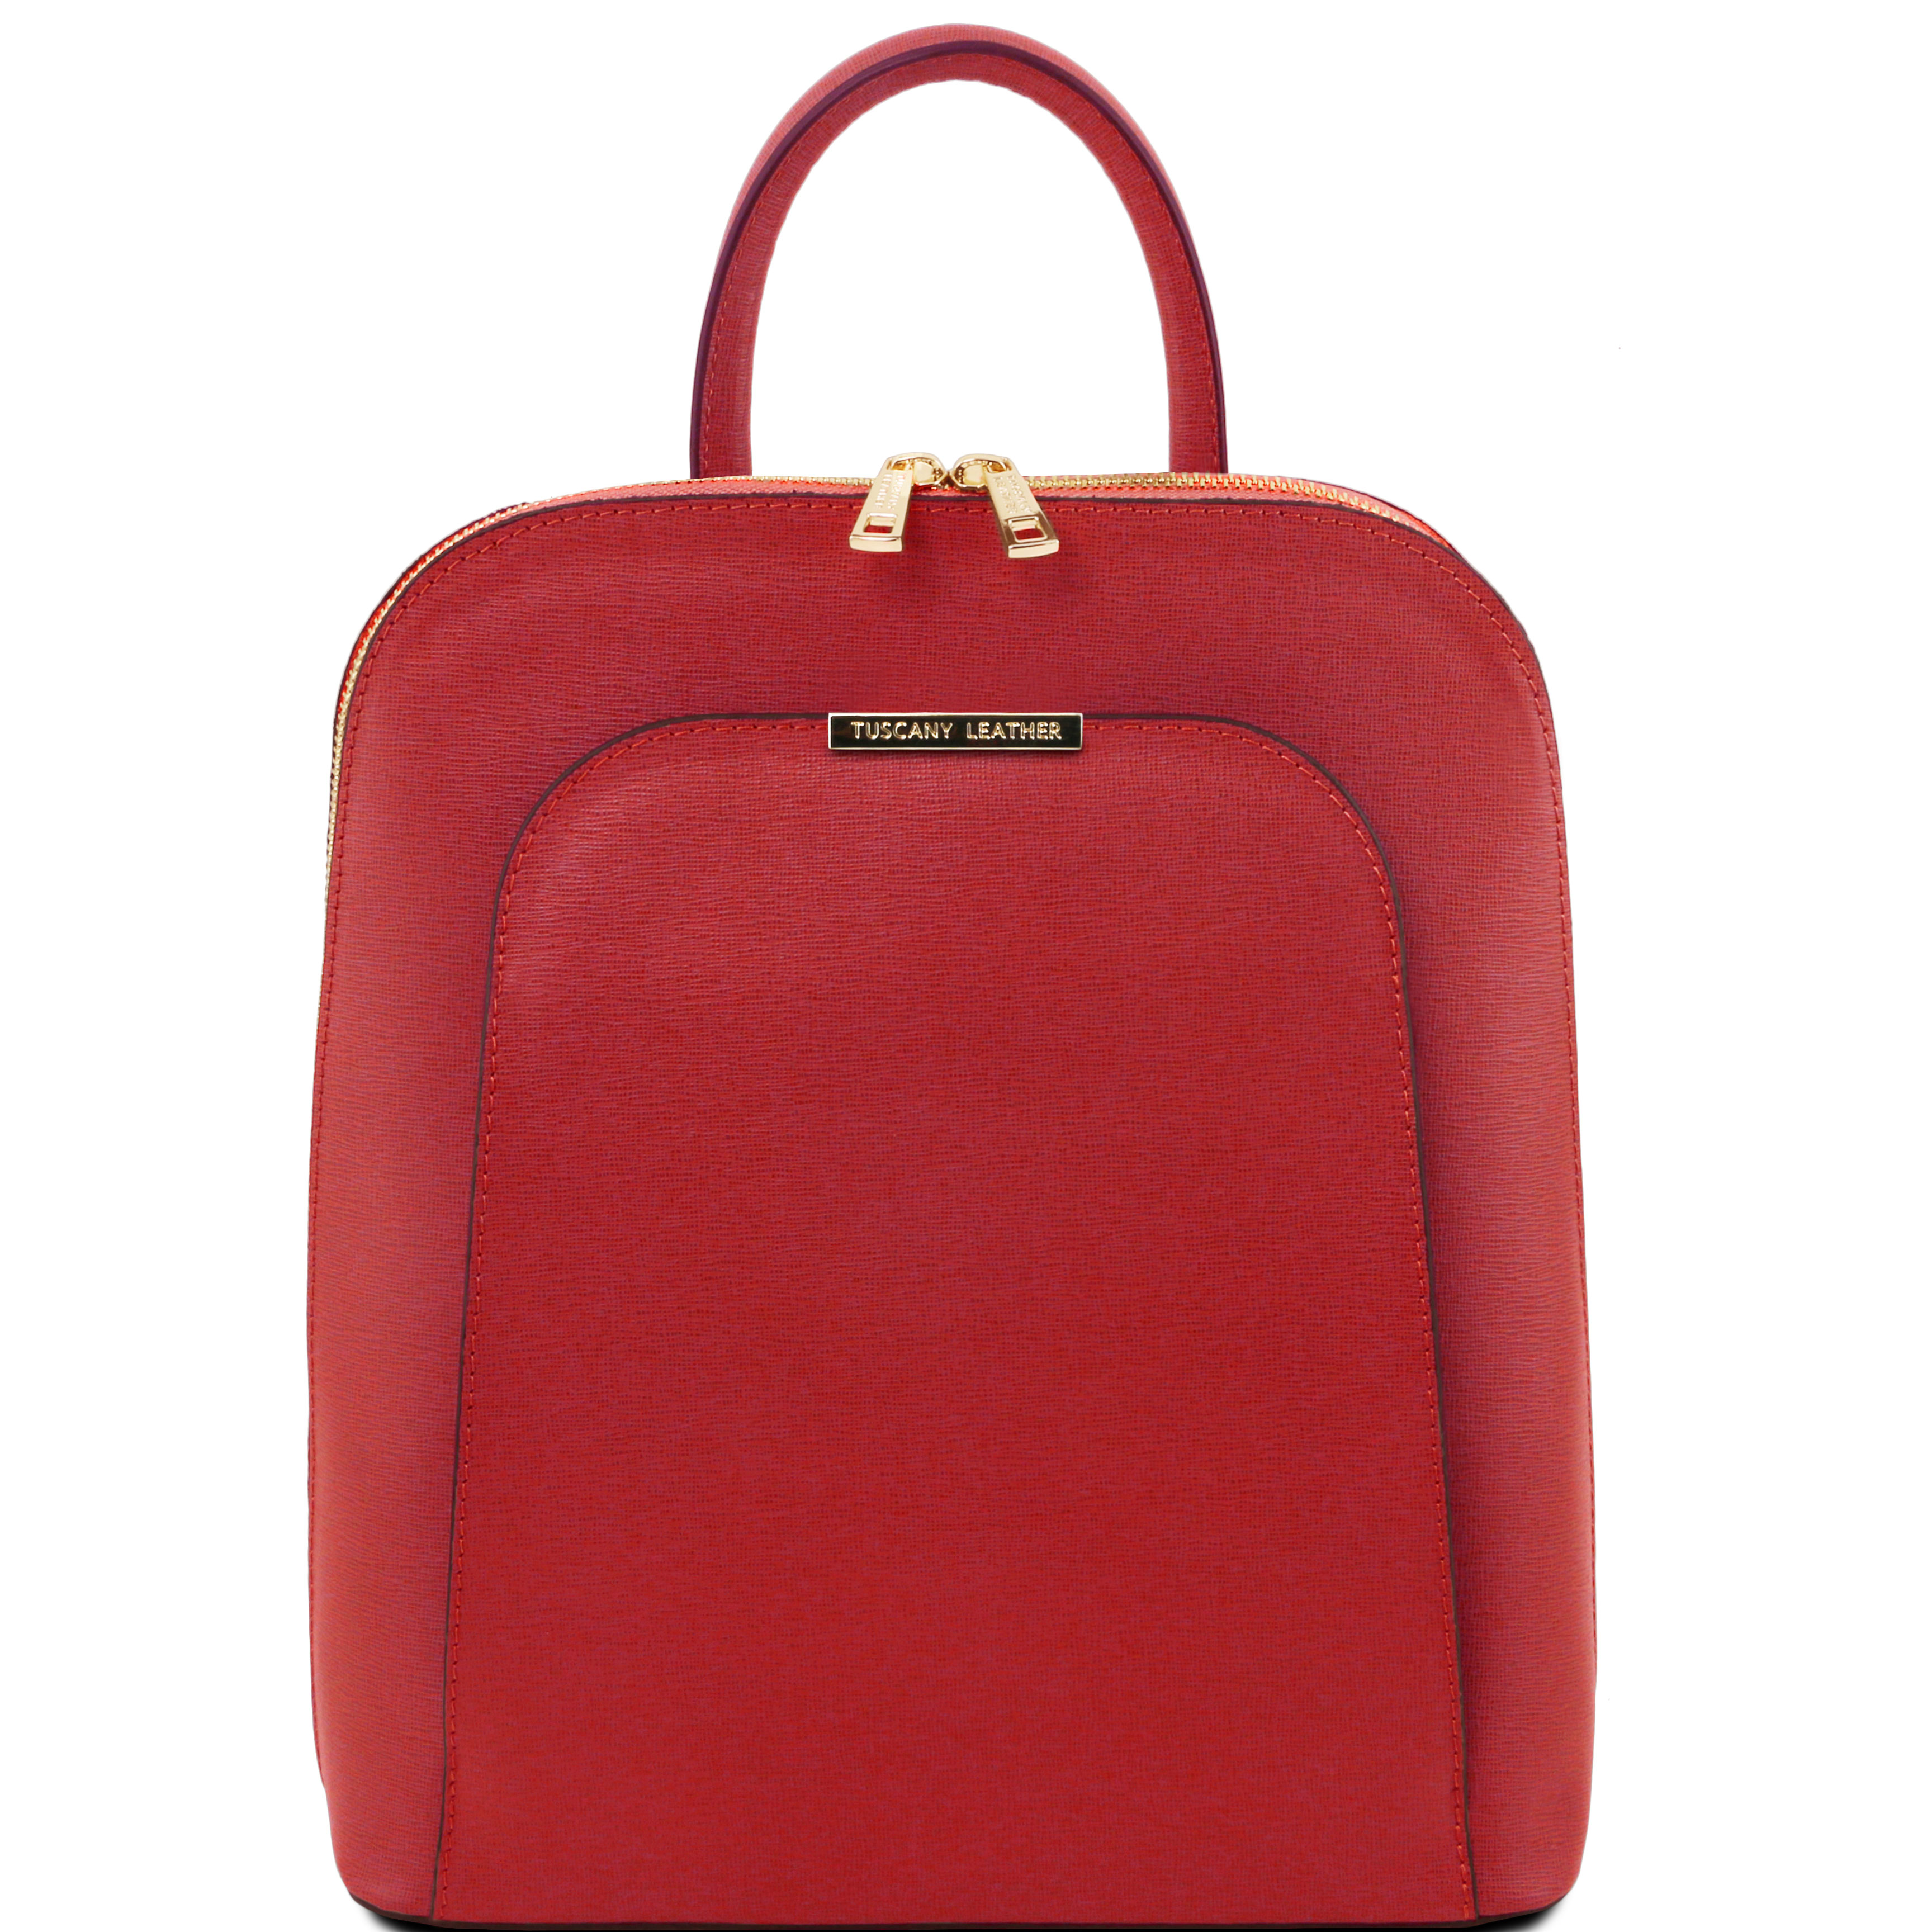 TL BAG - Rucsac rosu din piele saffiano